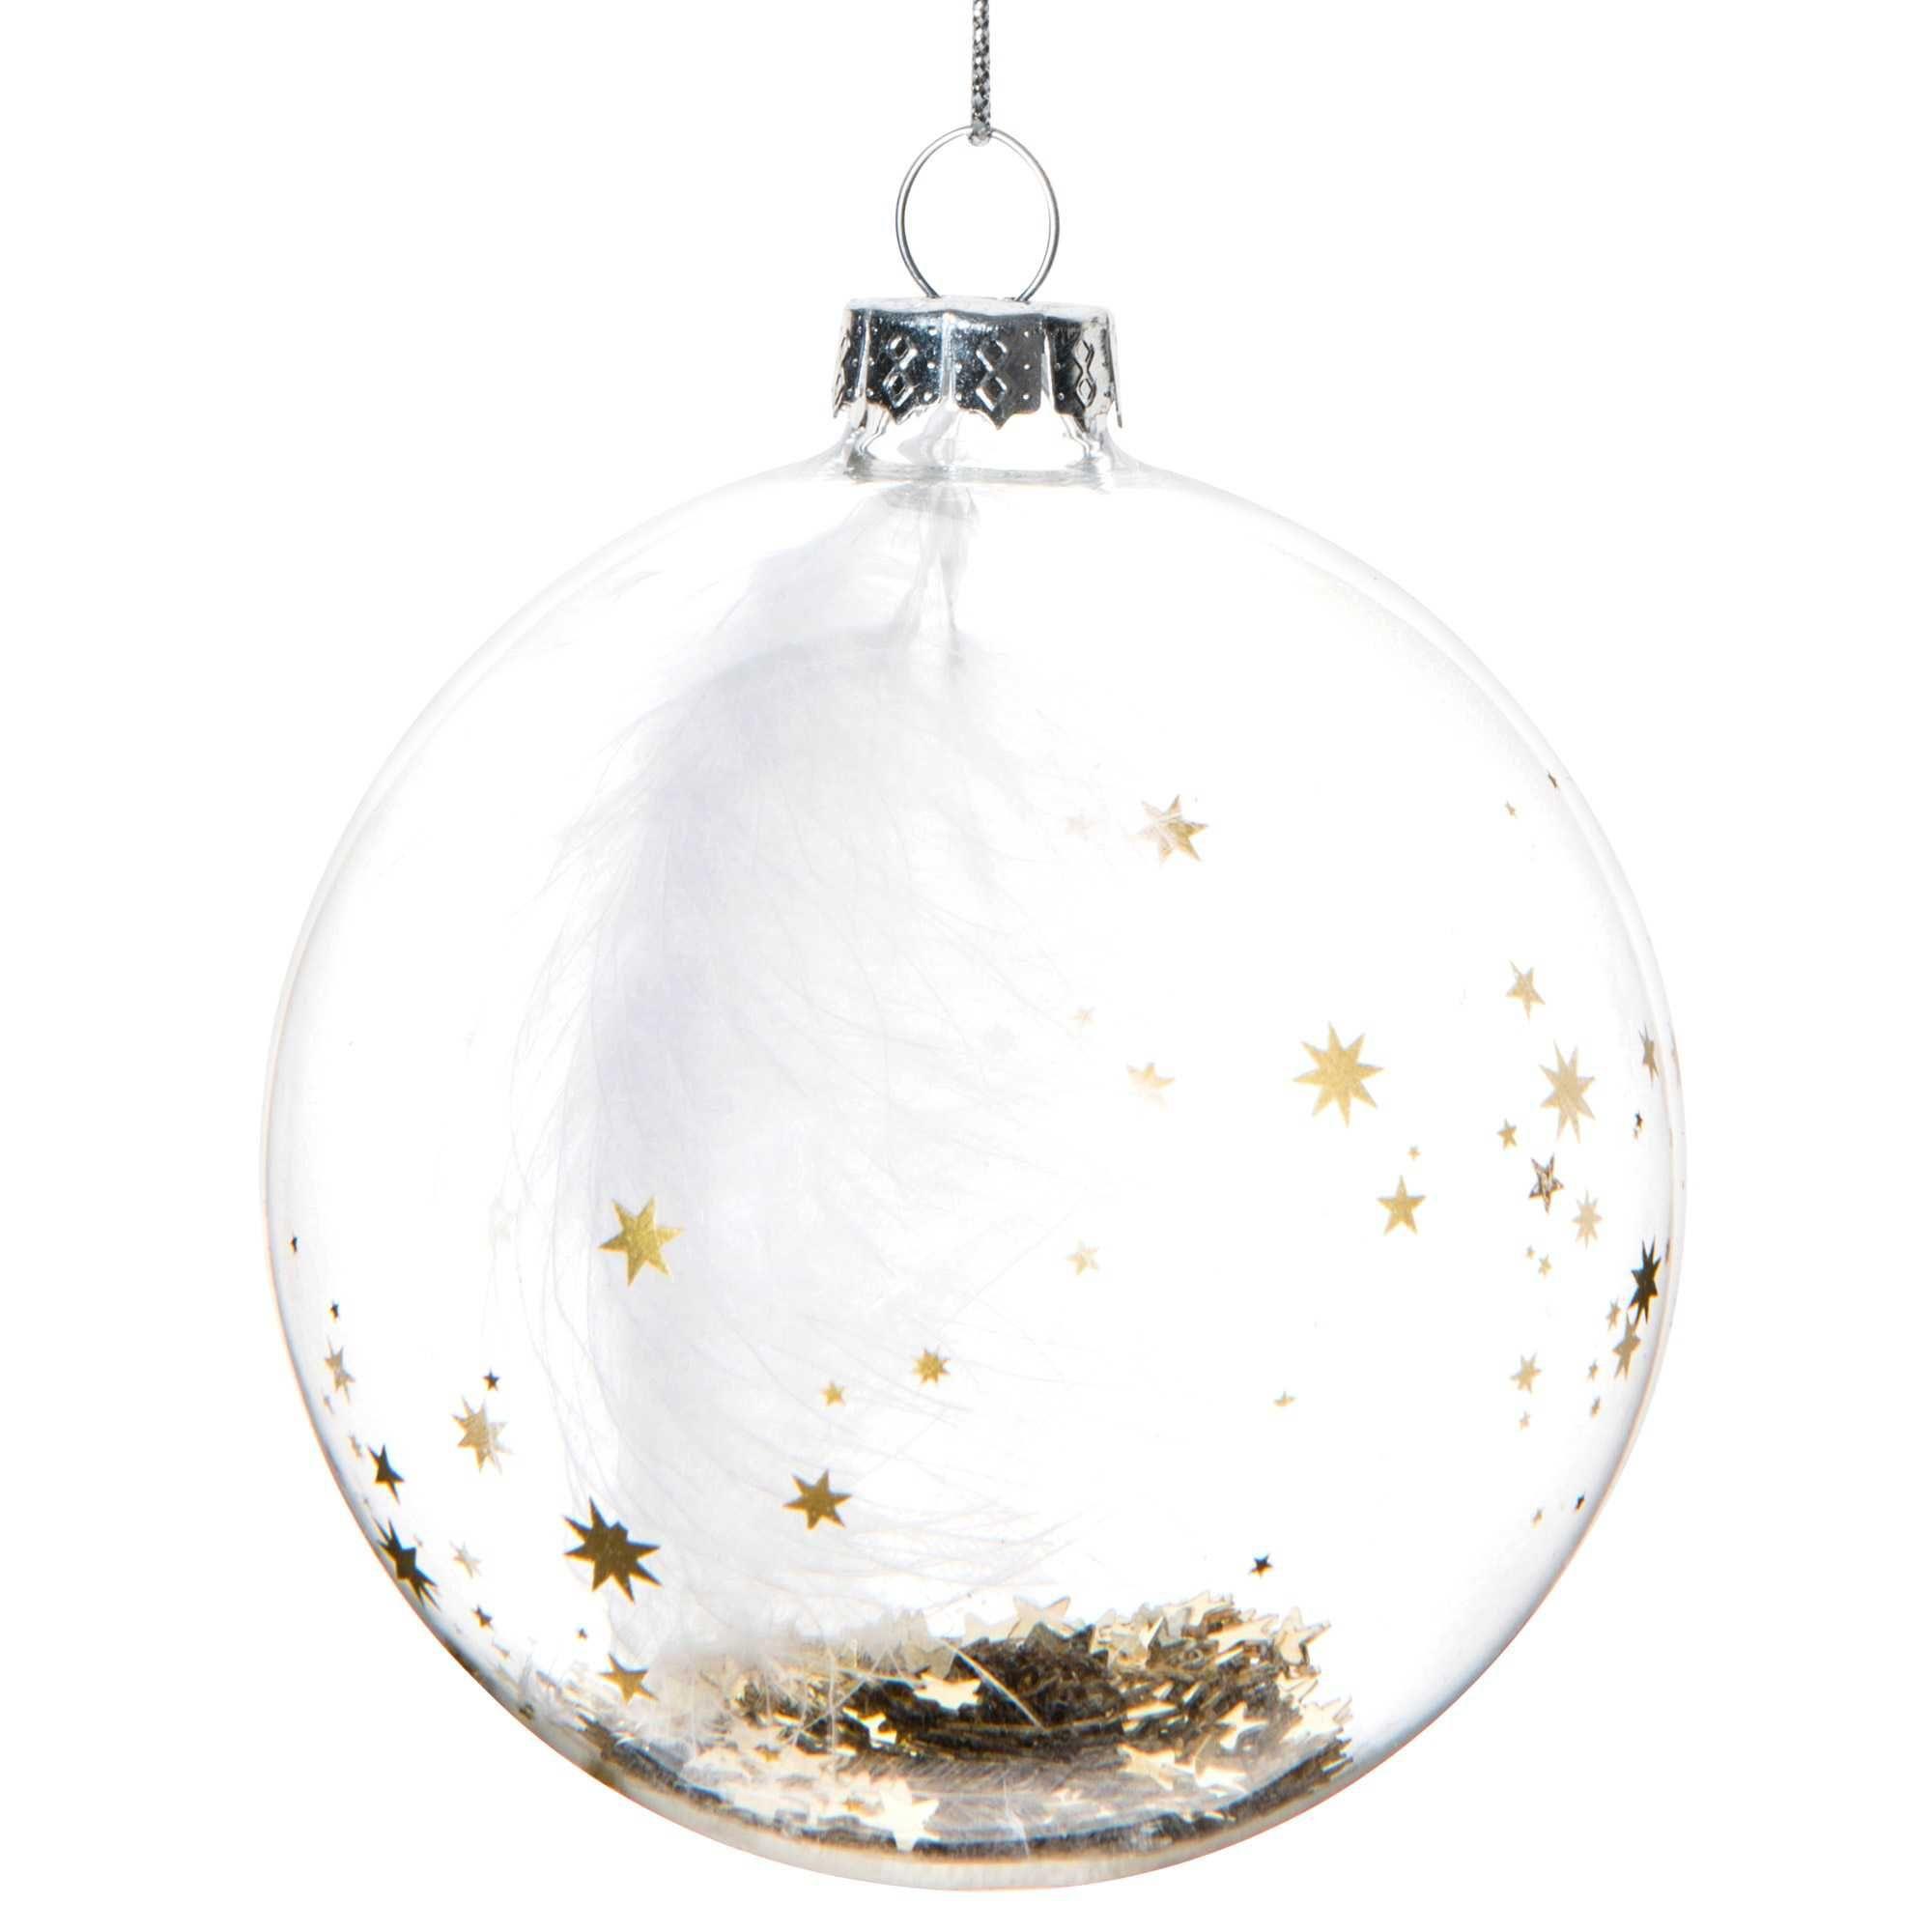 Boule de Noël transparente en verre 8 cm STARRY NIGHT   Vendu par